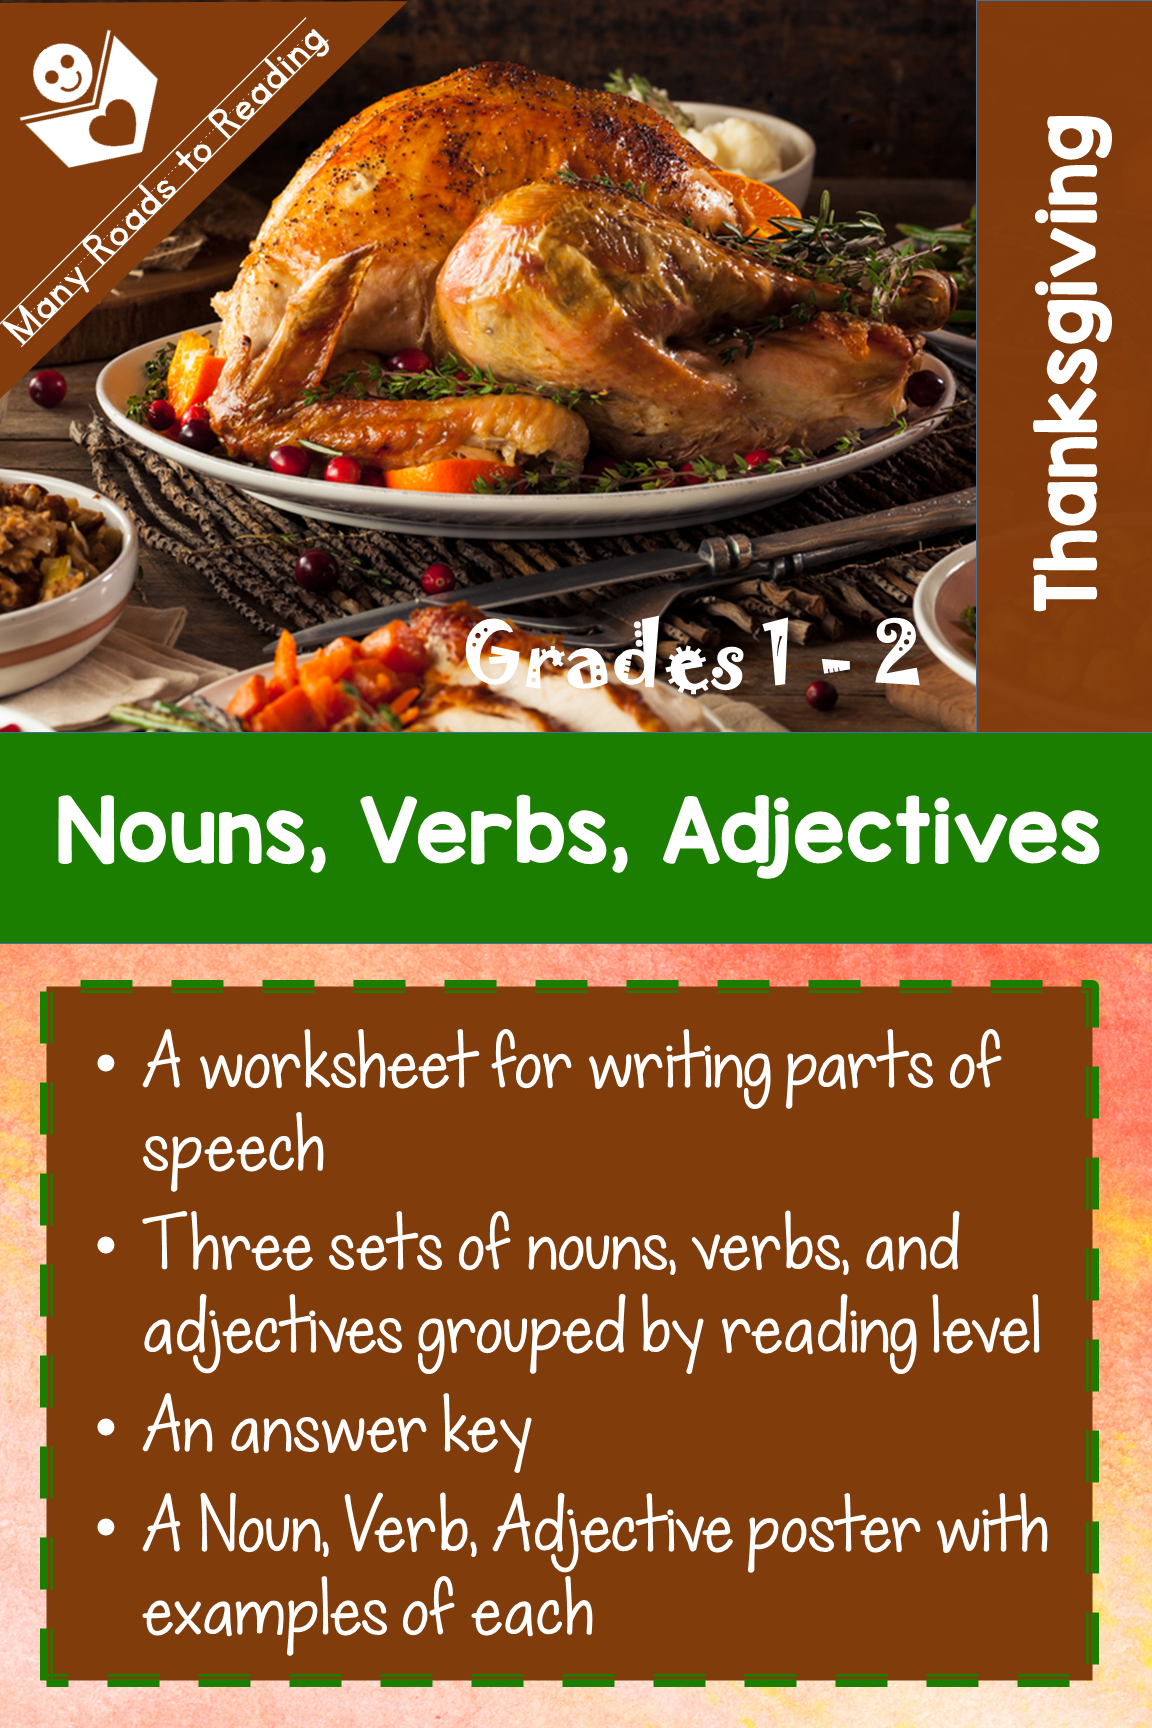 Thanksgiving Nouns Verbs Adjectives 1 2 Worksheet For